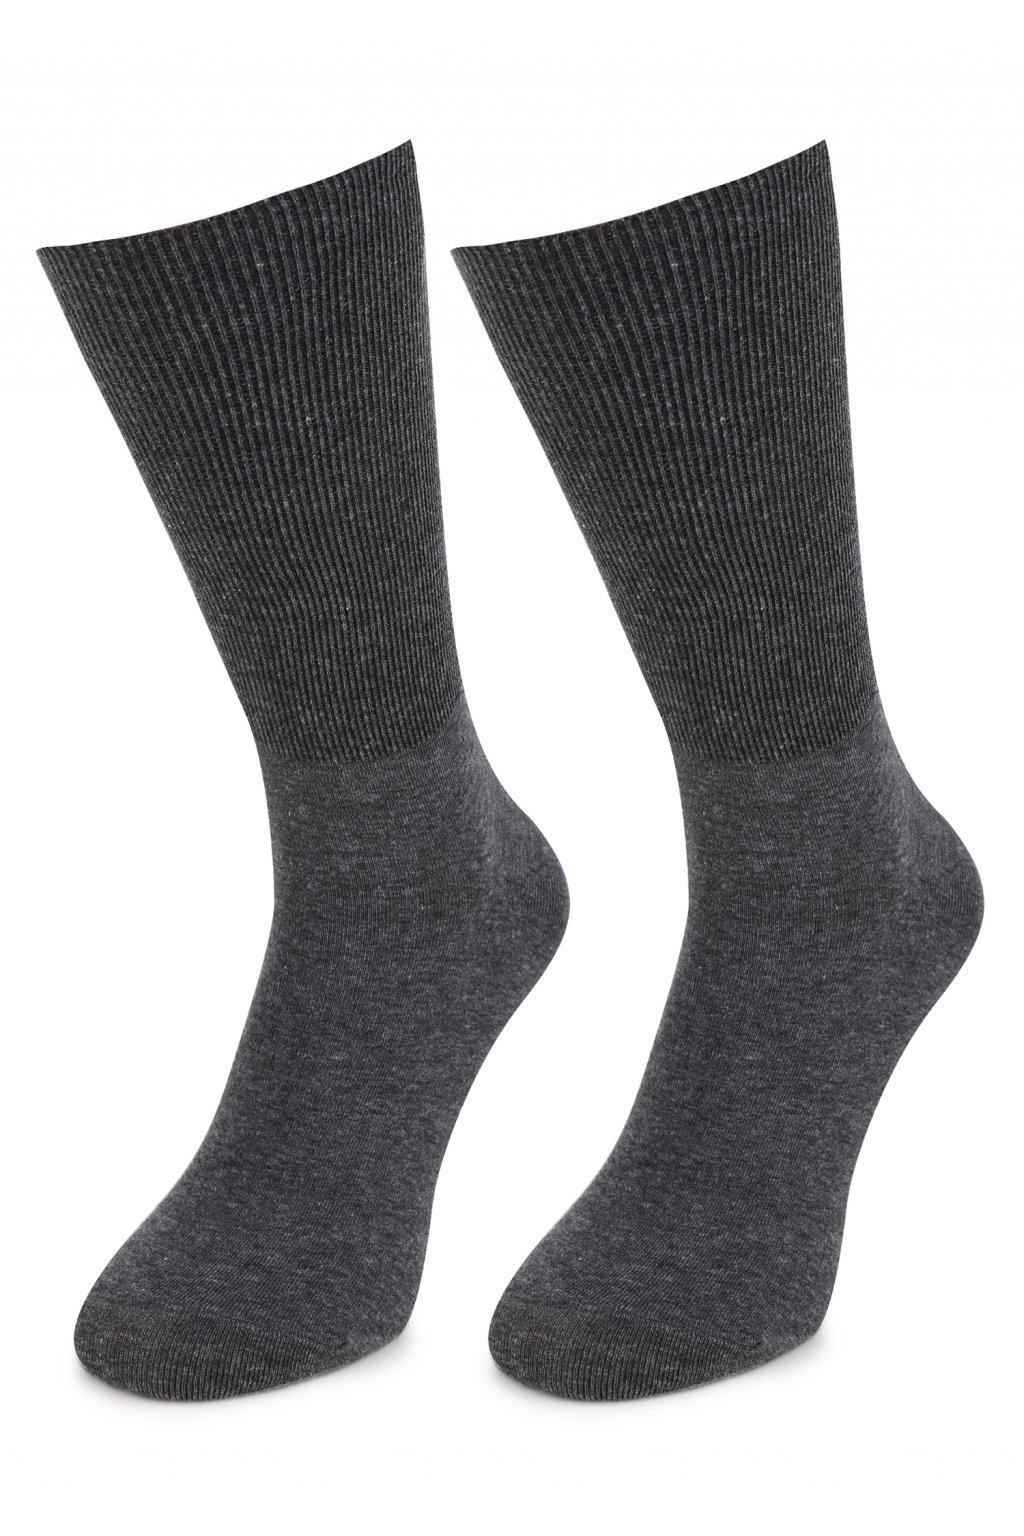 Ponožky MEN NO STRESS